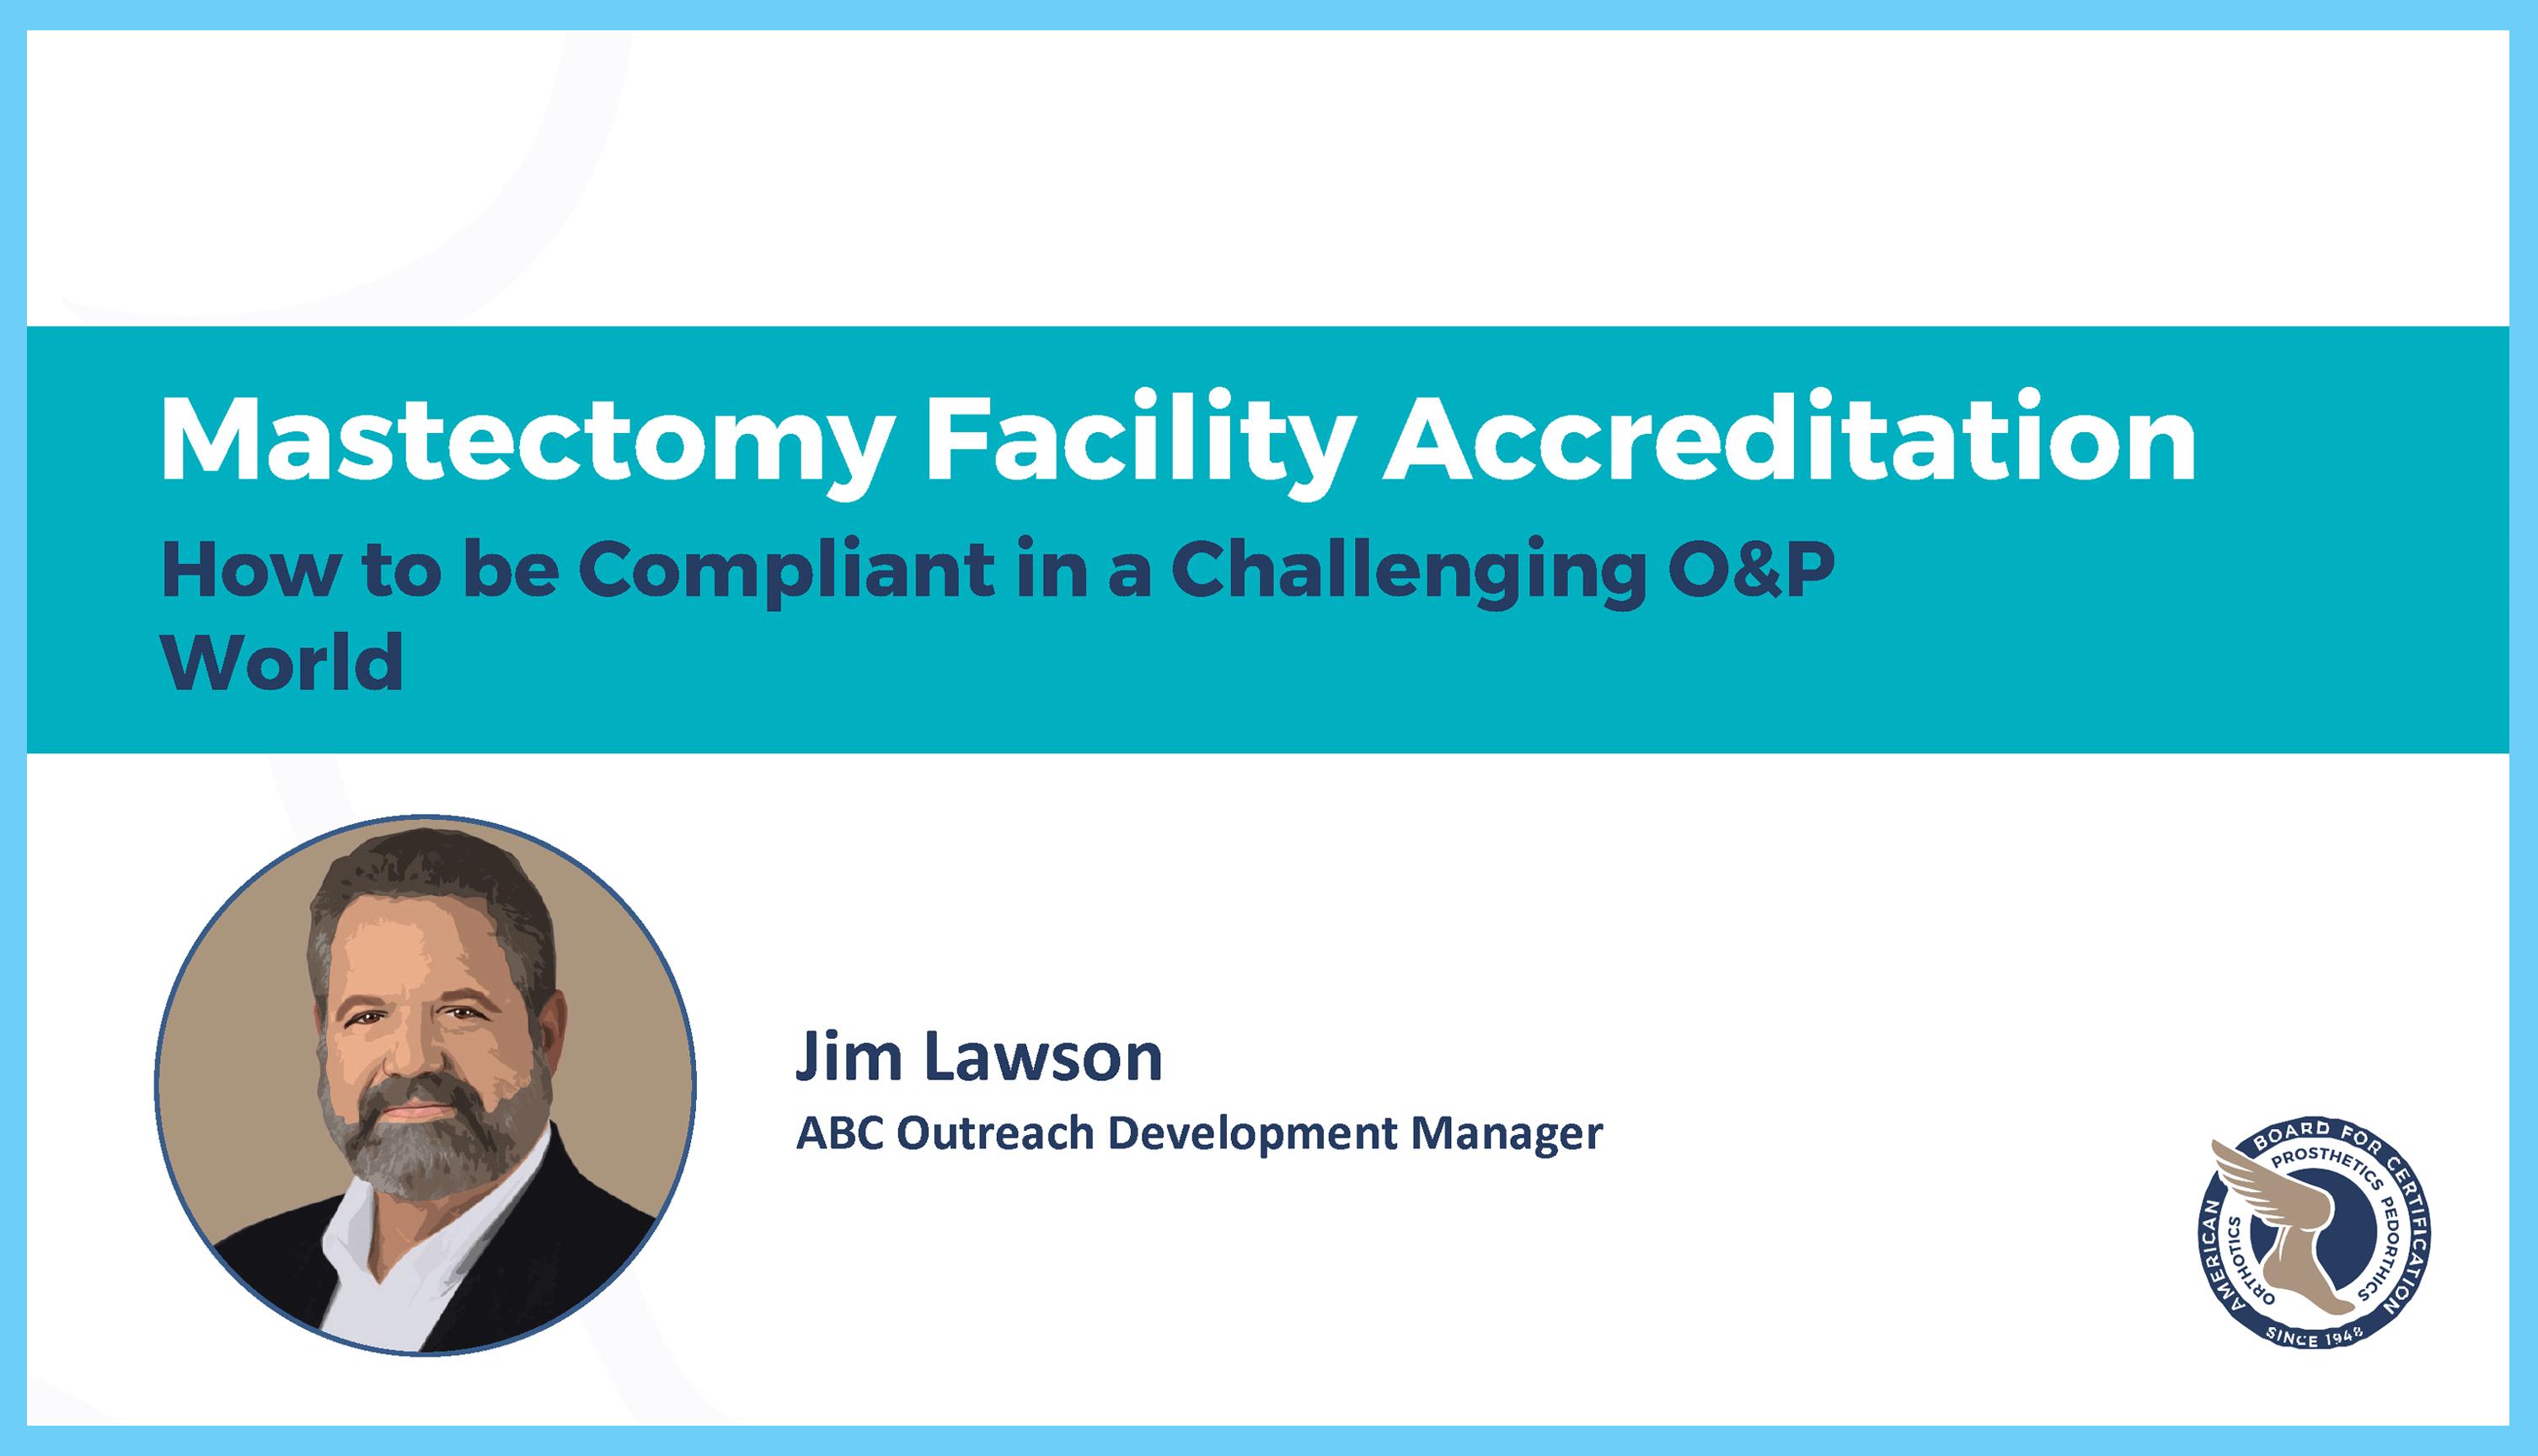 Mastectomy-Accred-Compliance-Webinar-Nov2020_icon